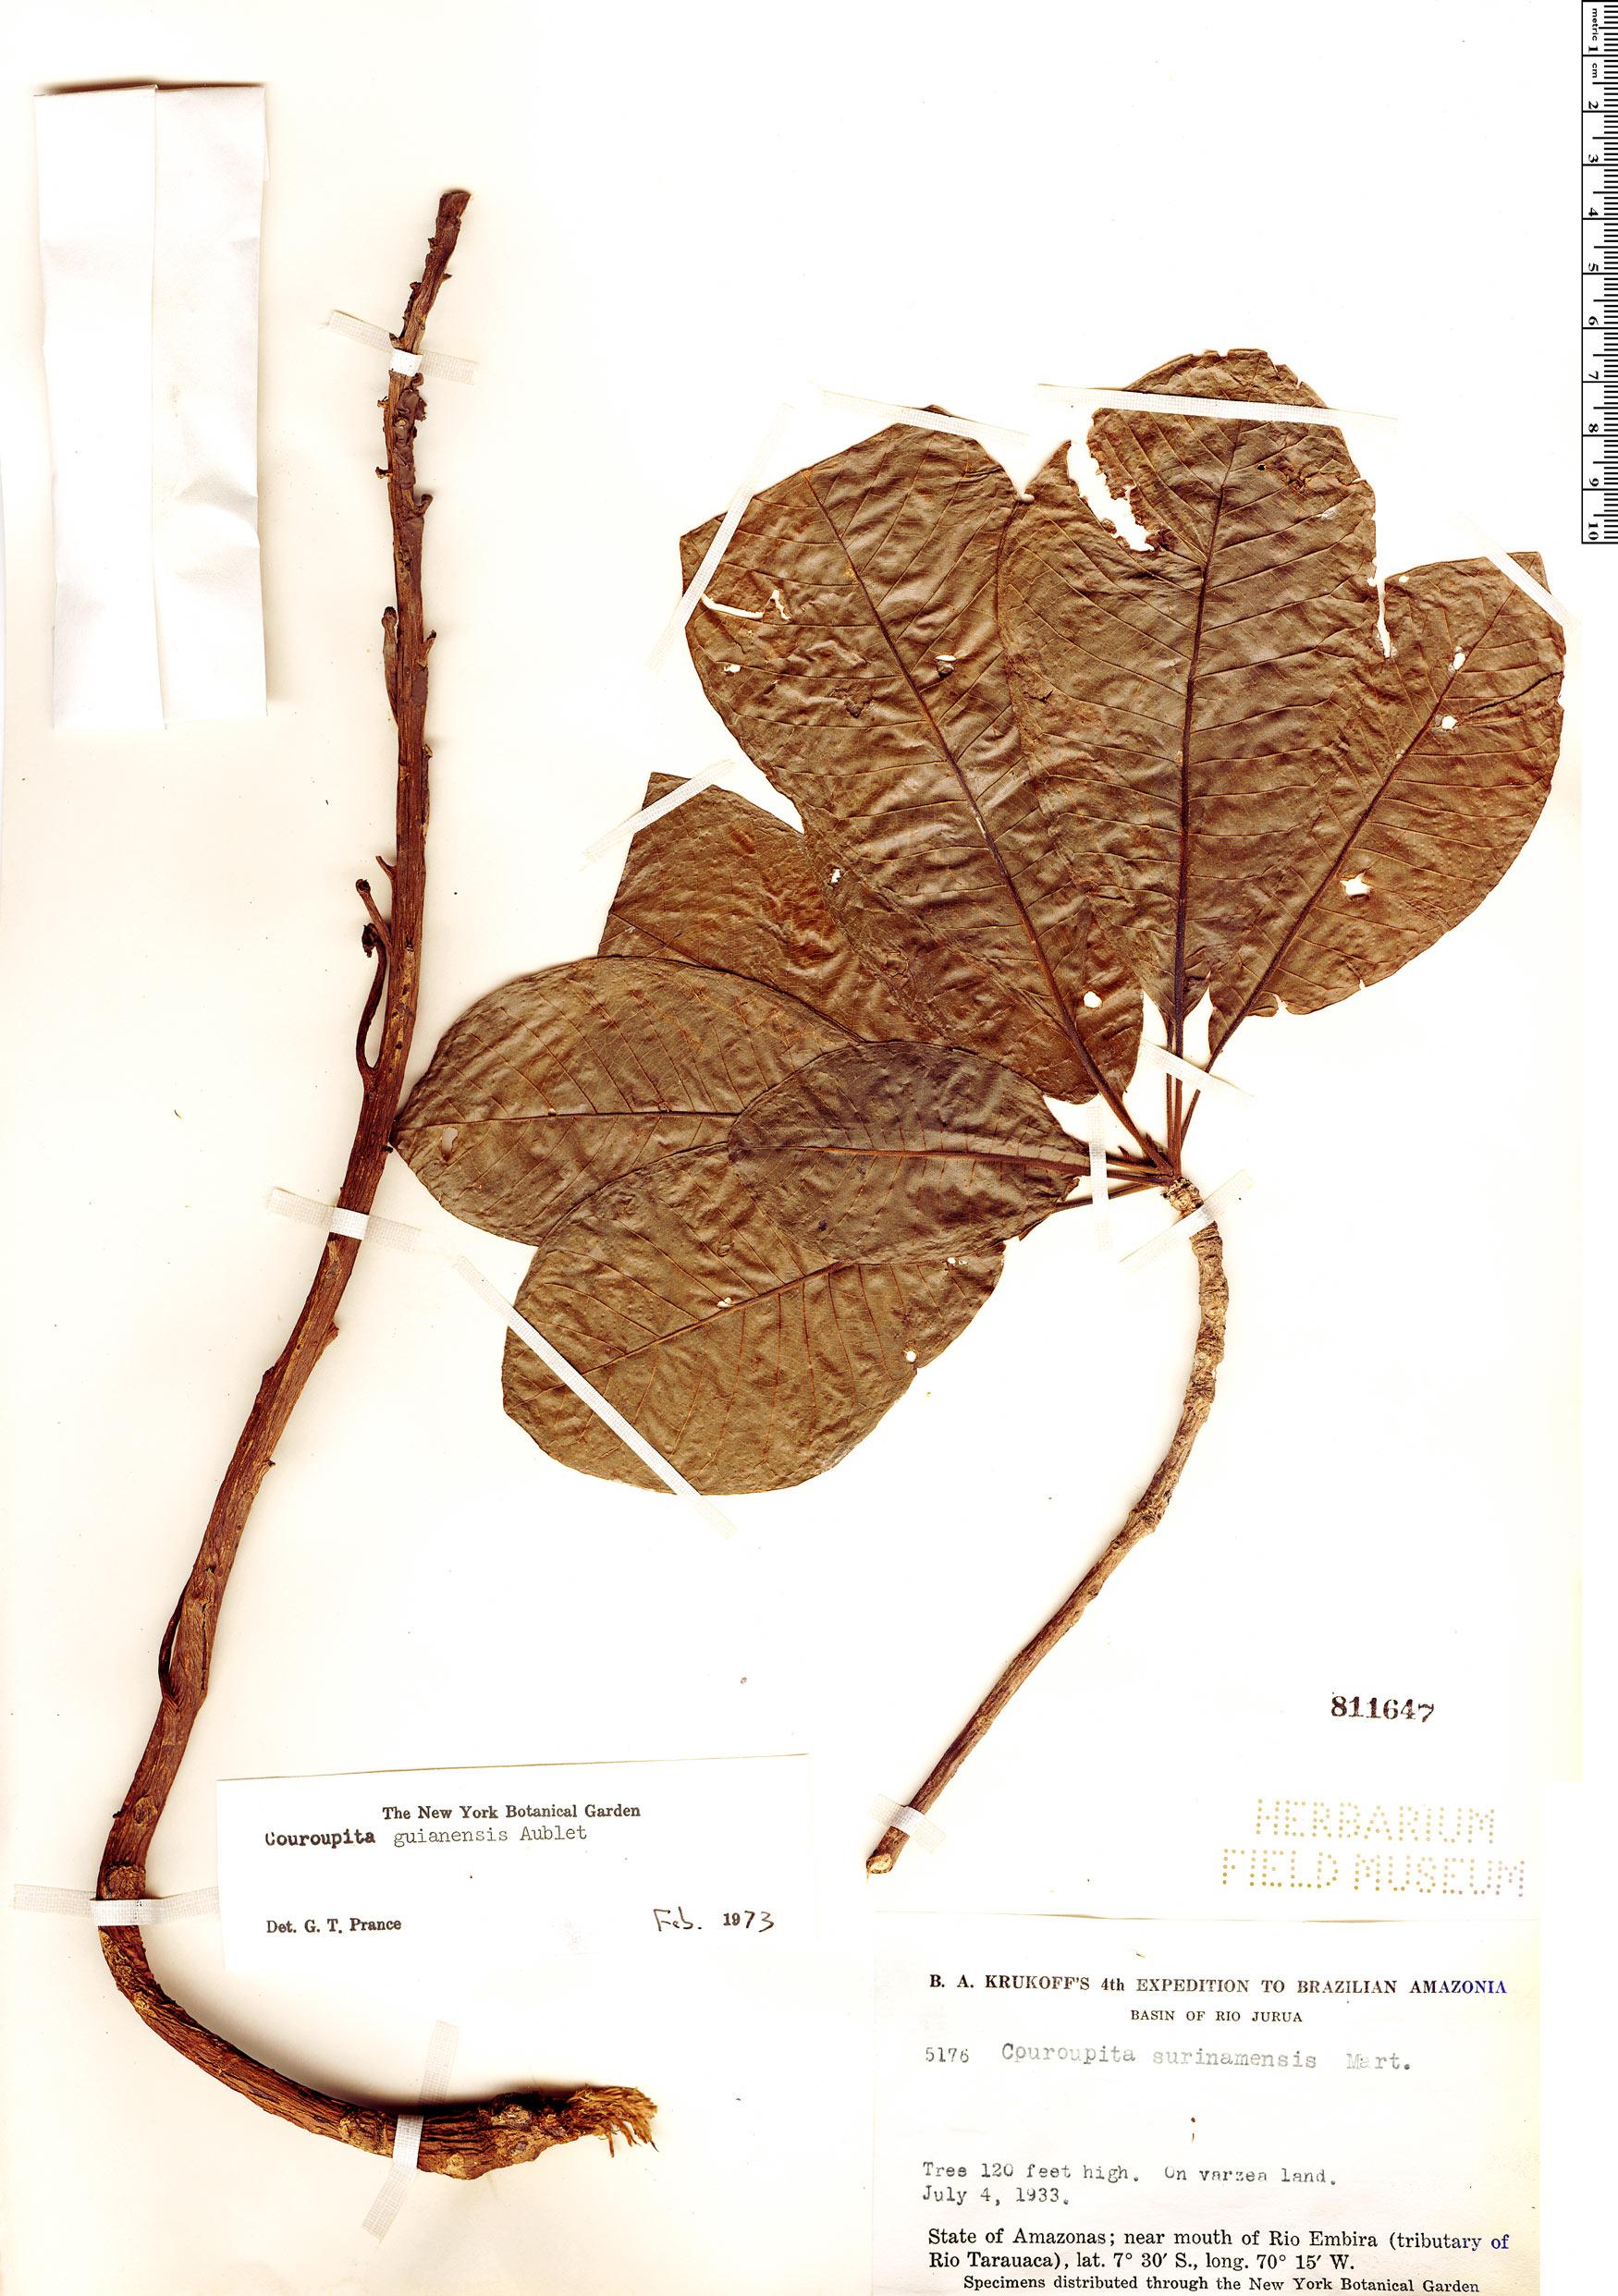 Specimen: Couroupita guianensis